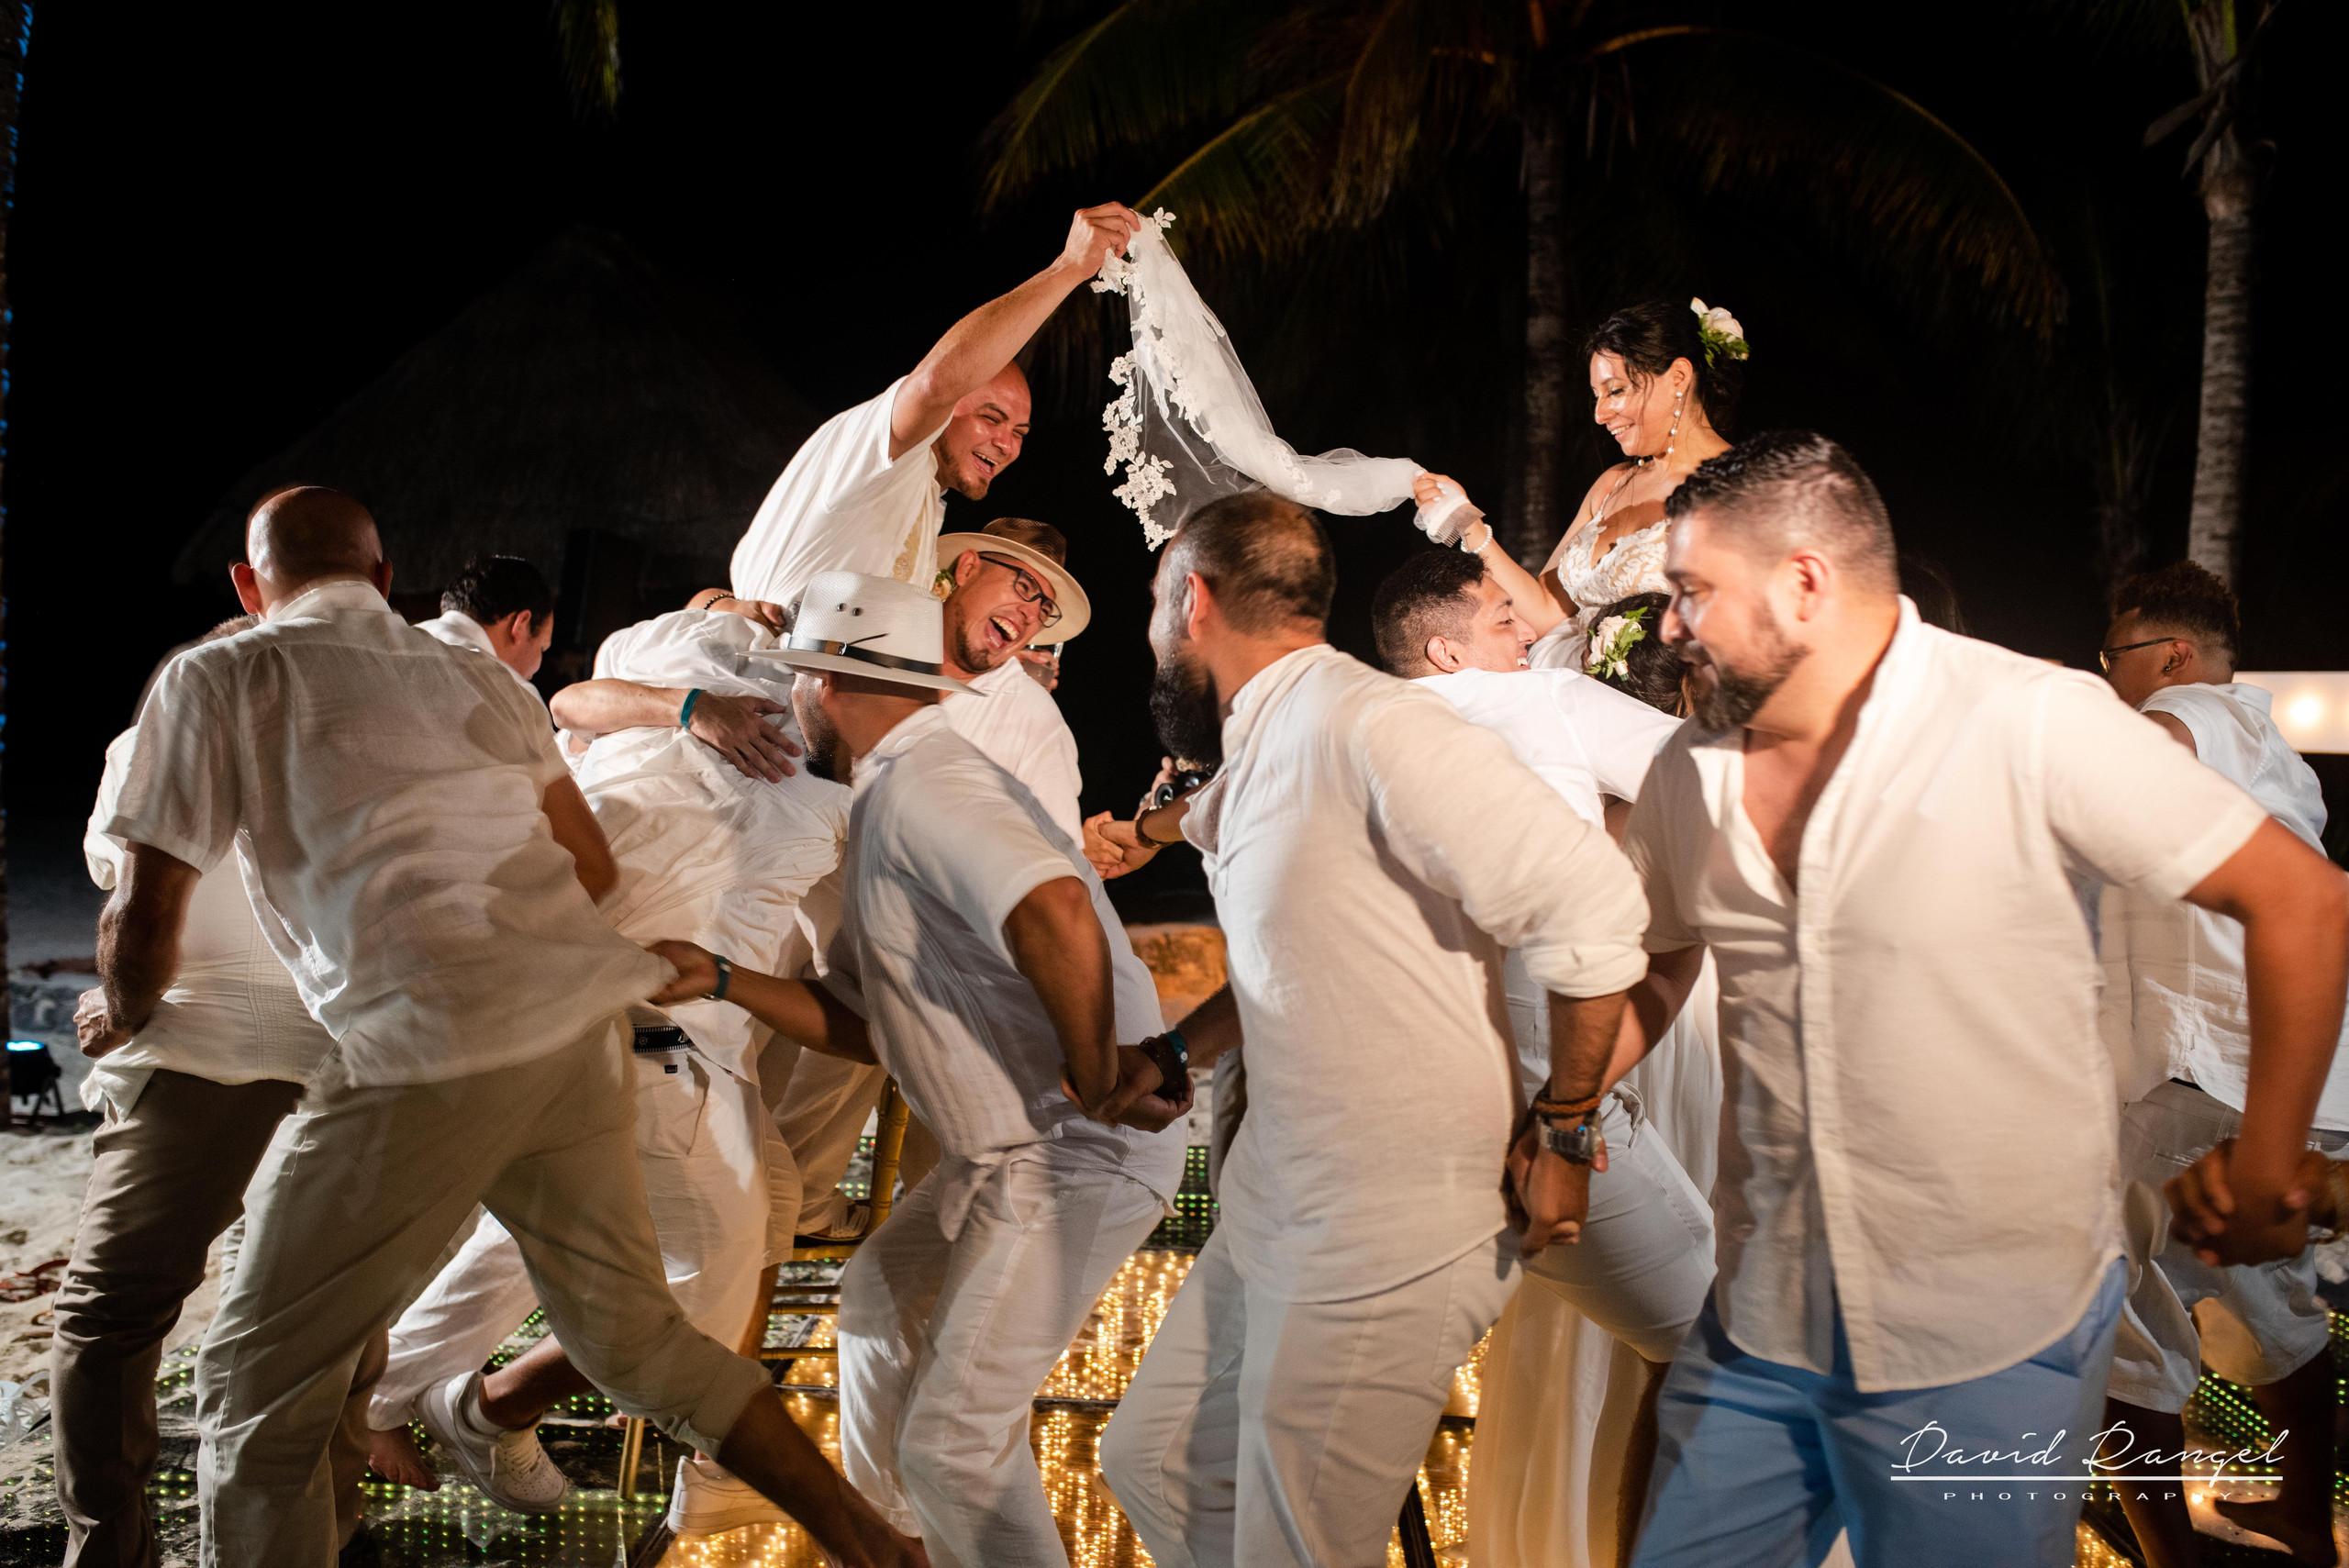 first+dance+occidental+xcaret+venue+dance+floor+bride+groom+love+letters